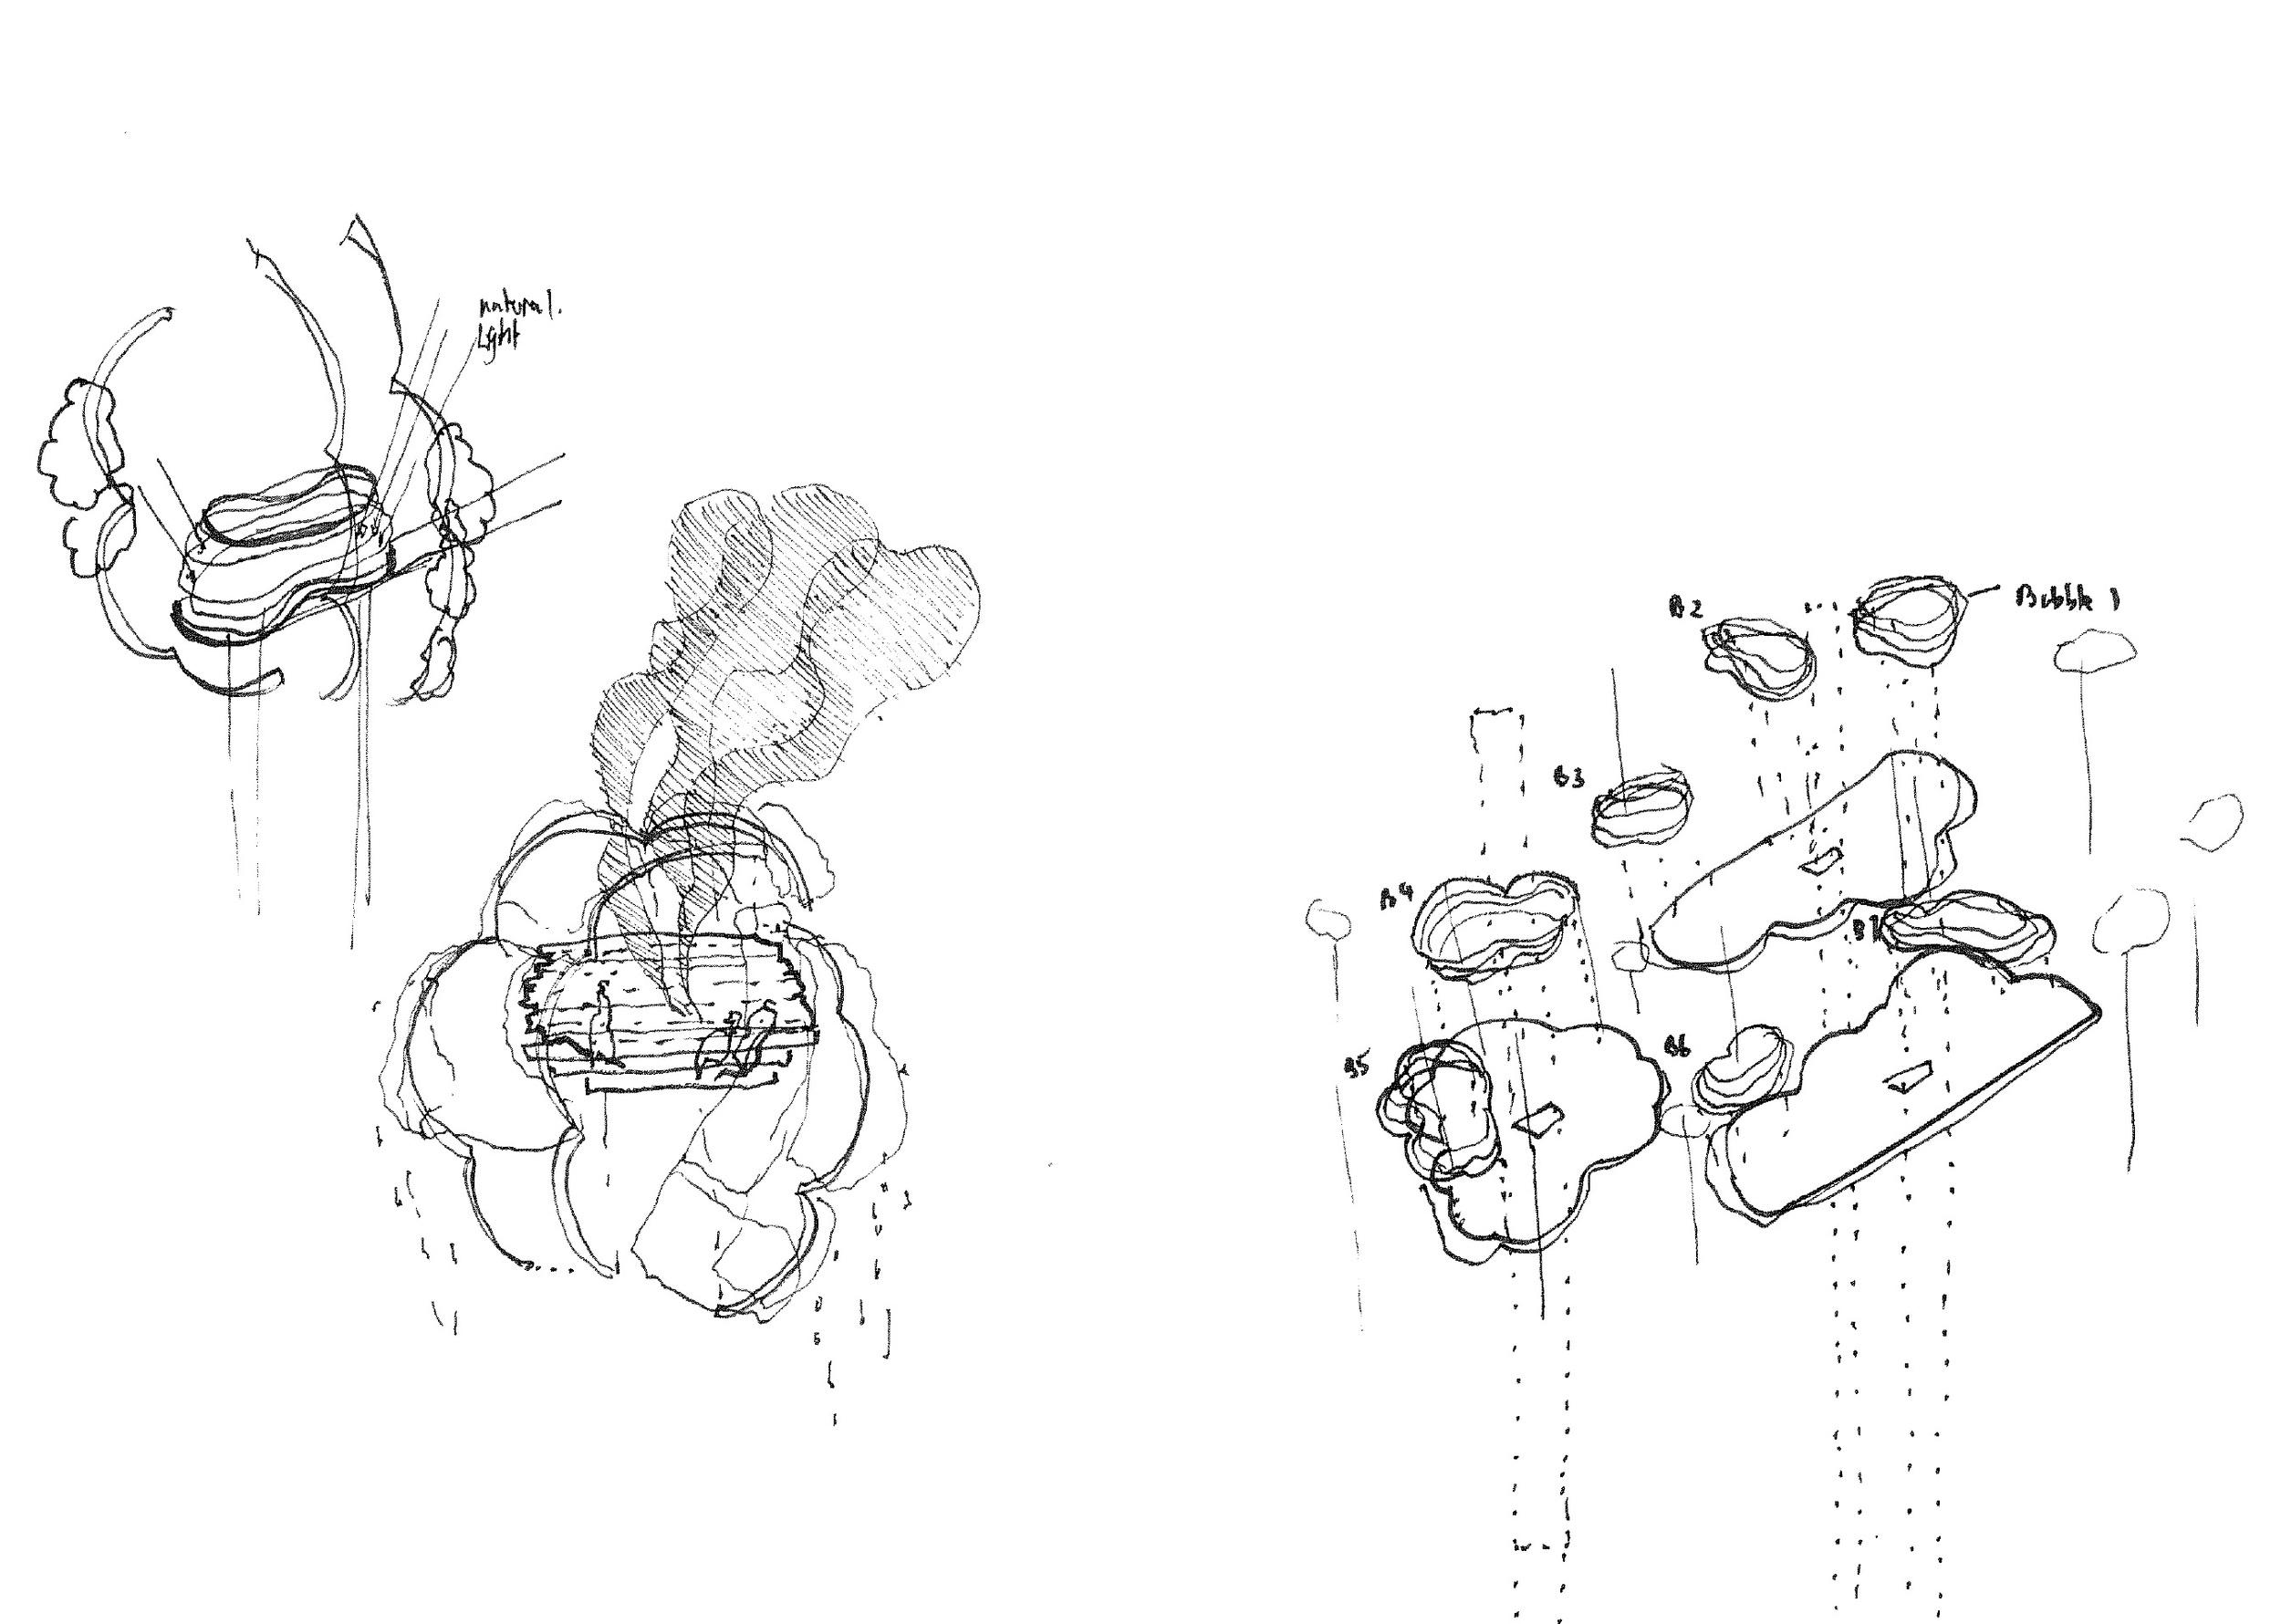 150619 Tracy Sketch panel 2.jpg